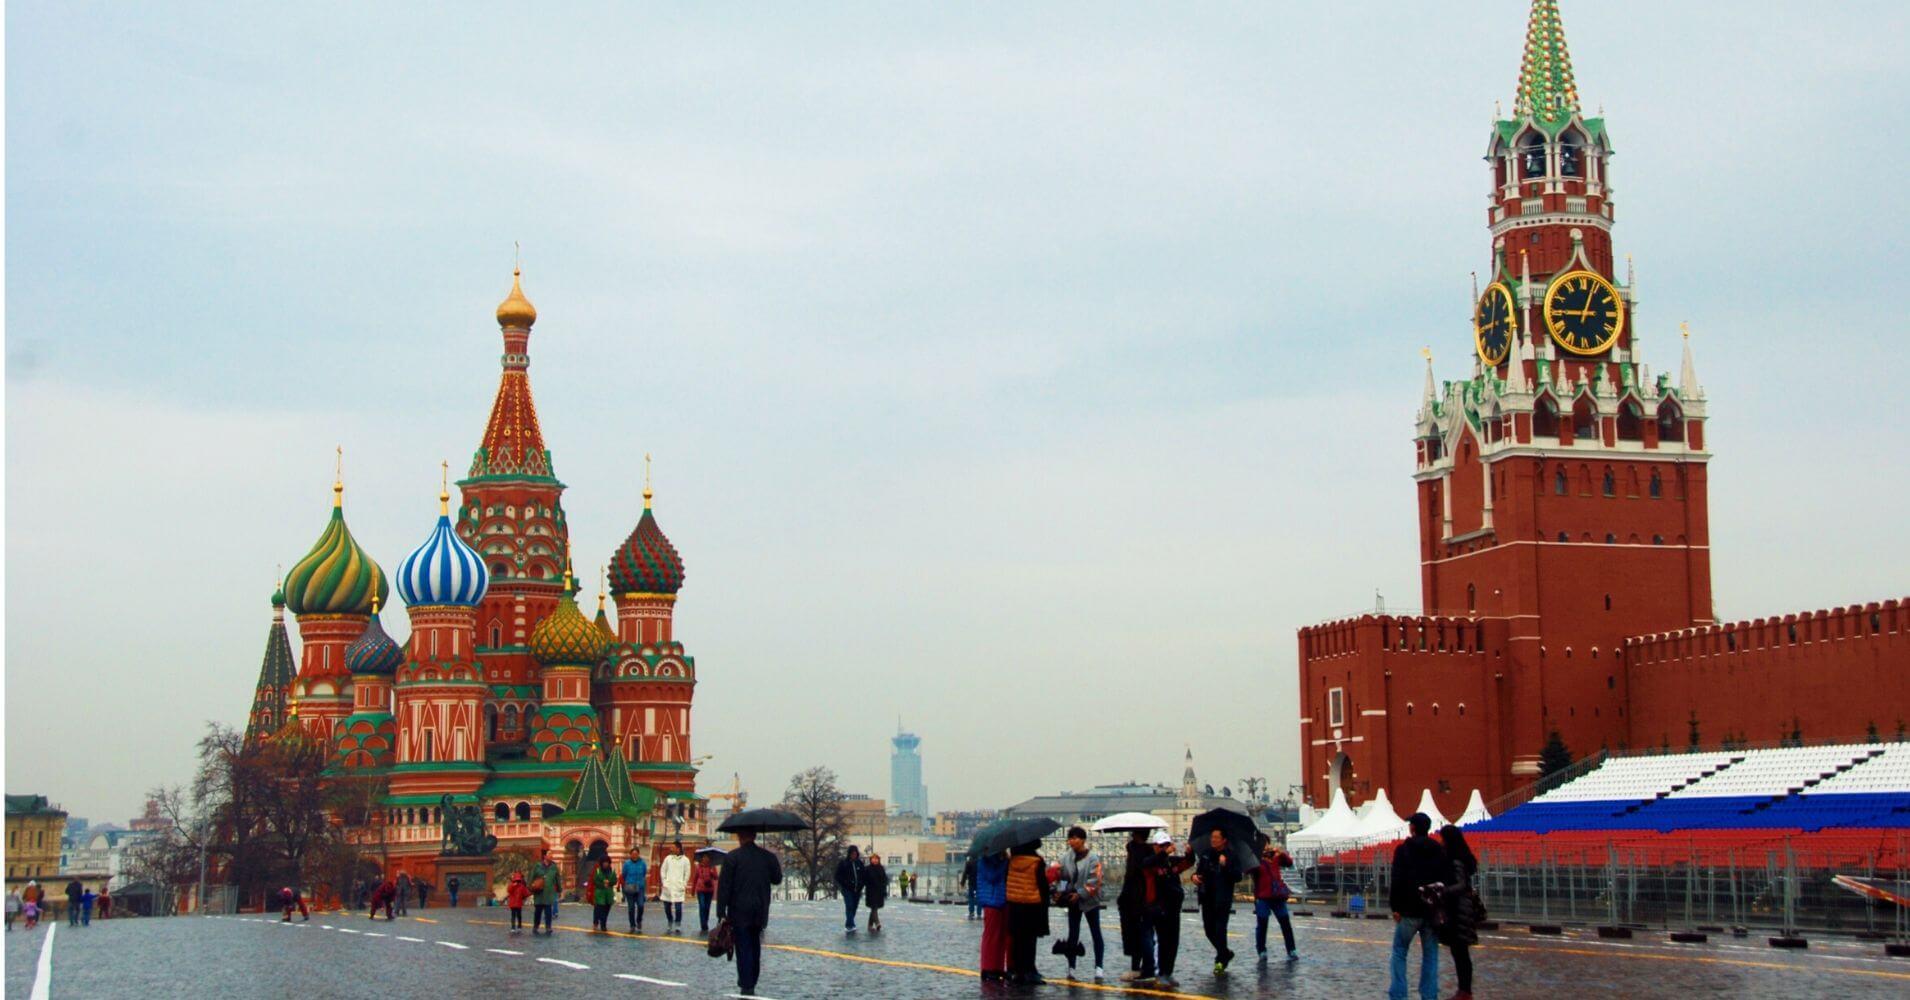 Plaza Roja de Moscú, Rusia.